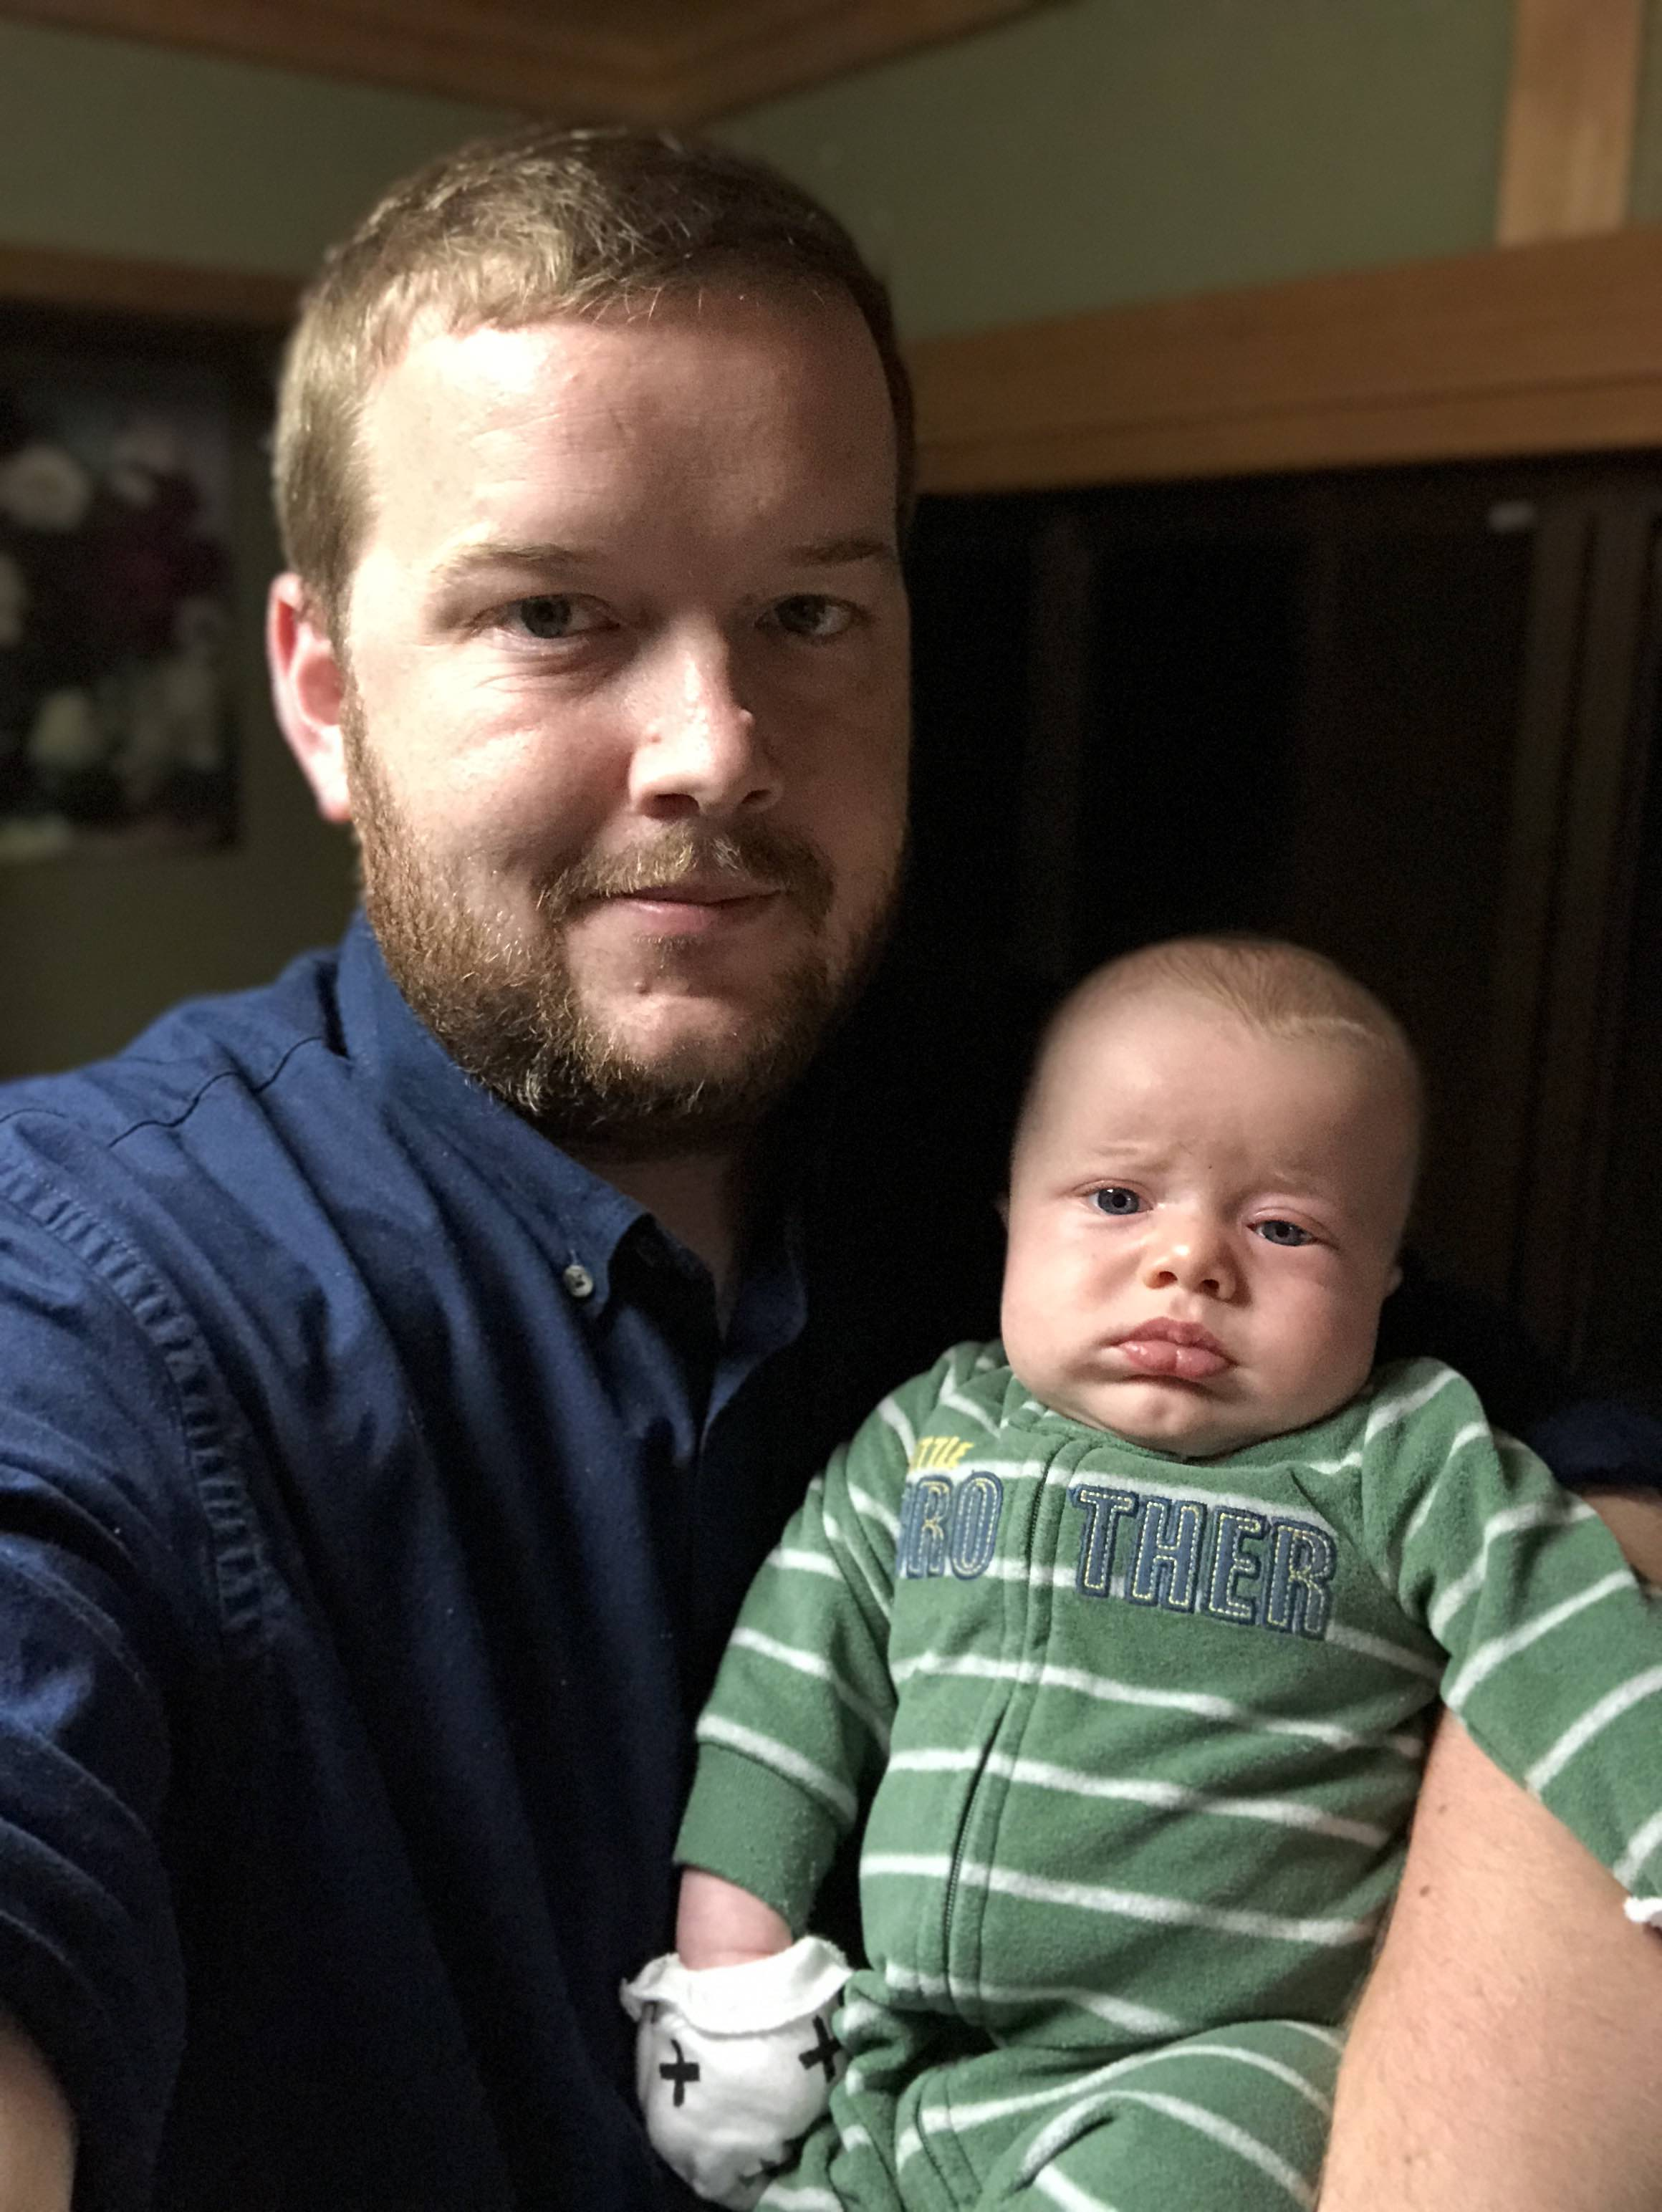 Robert Abbott Sayre has no idea he's in Japan. He's 11 weeks old this week!